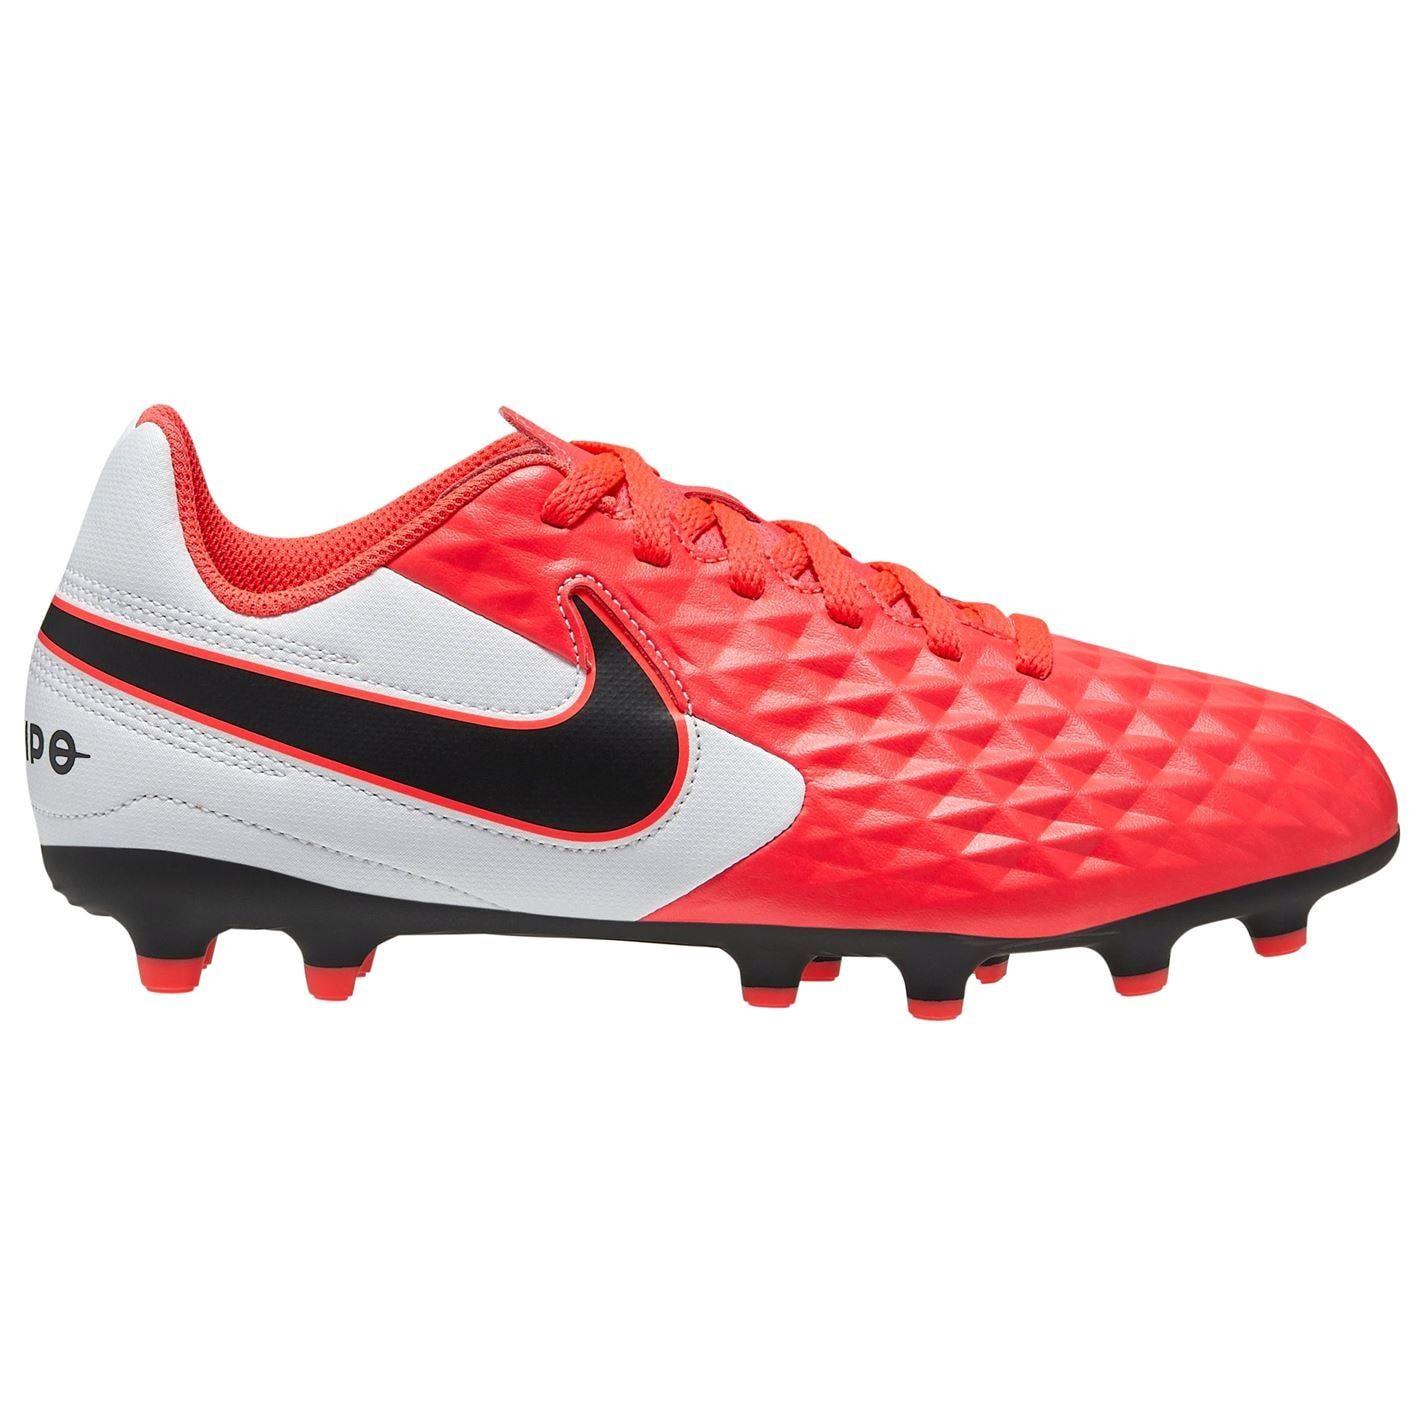 miniature 20 - Nike-Tiempo-Legend-Academy-Junior-FG-Firm-Ground-football-boots-Boys-Football